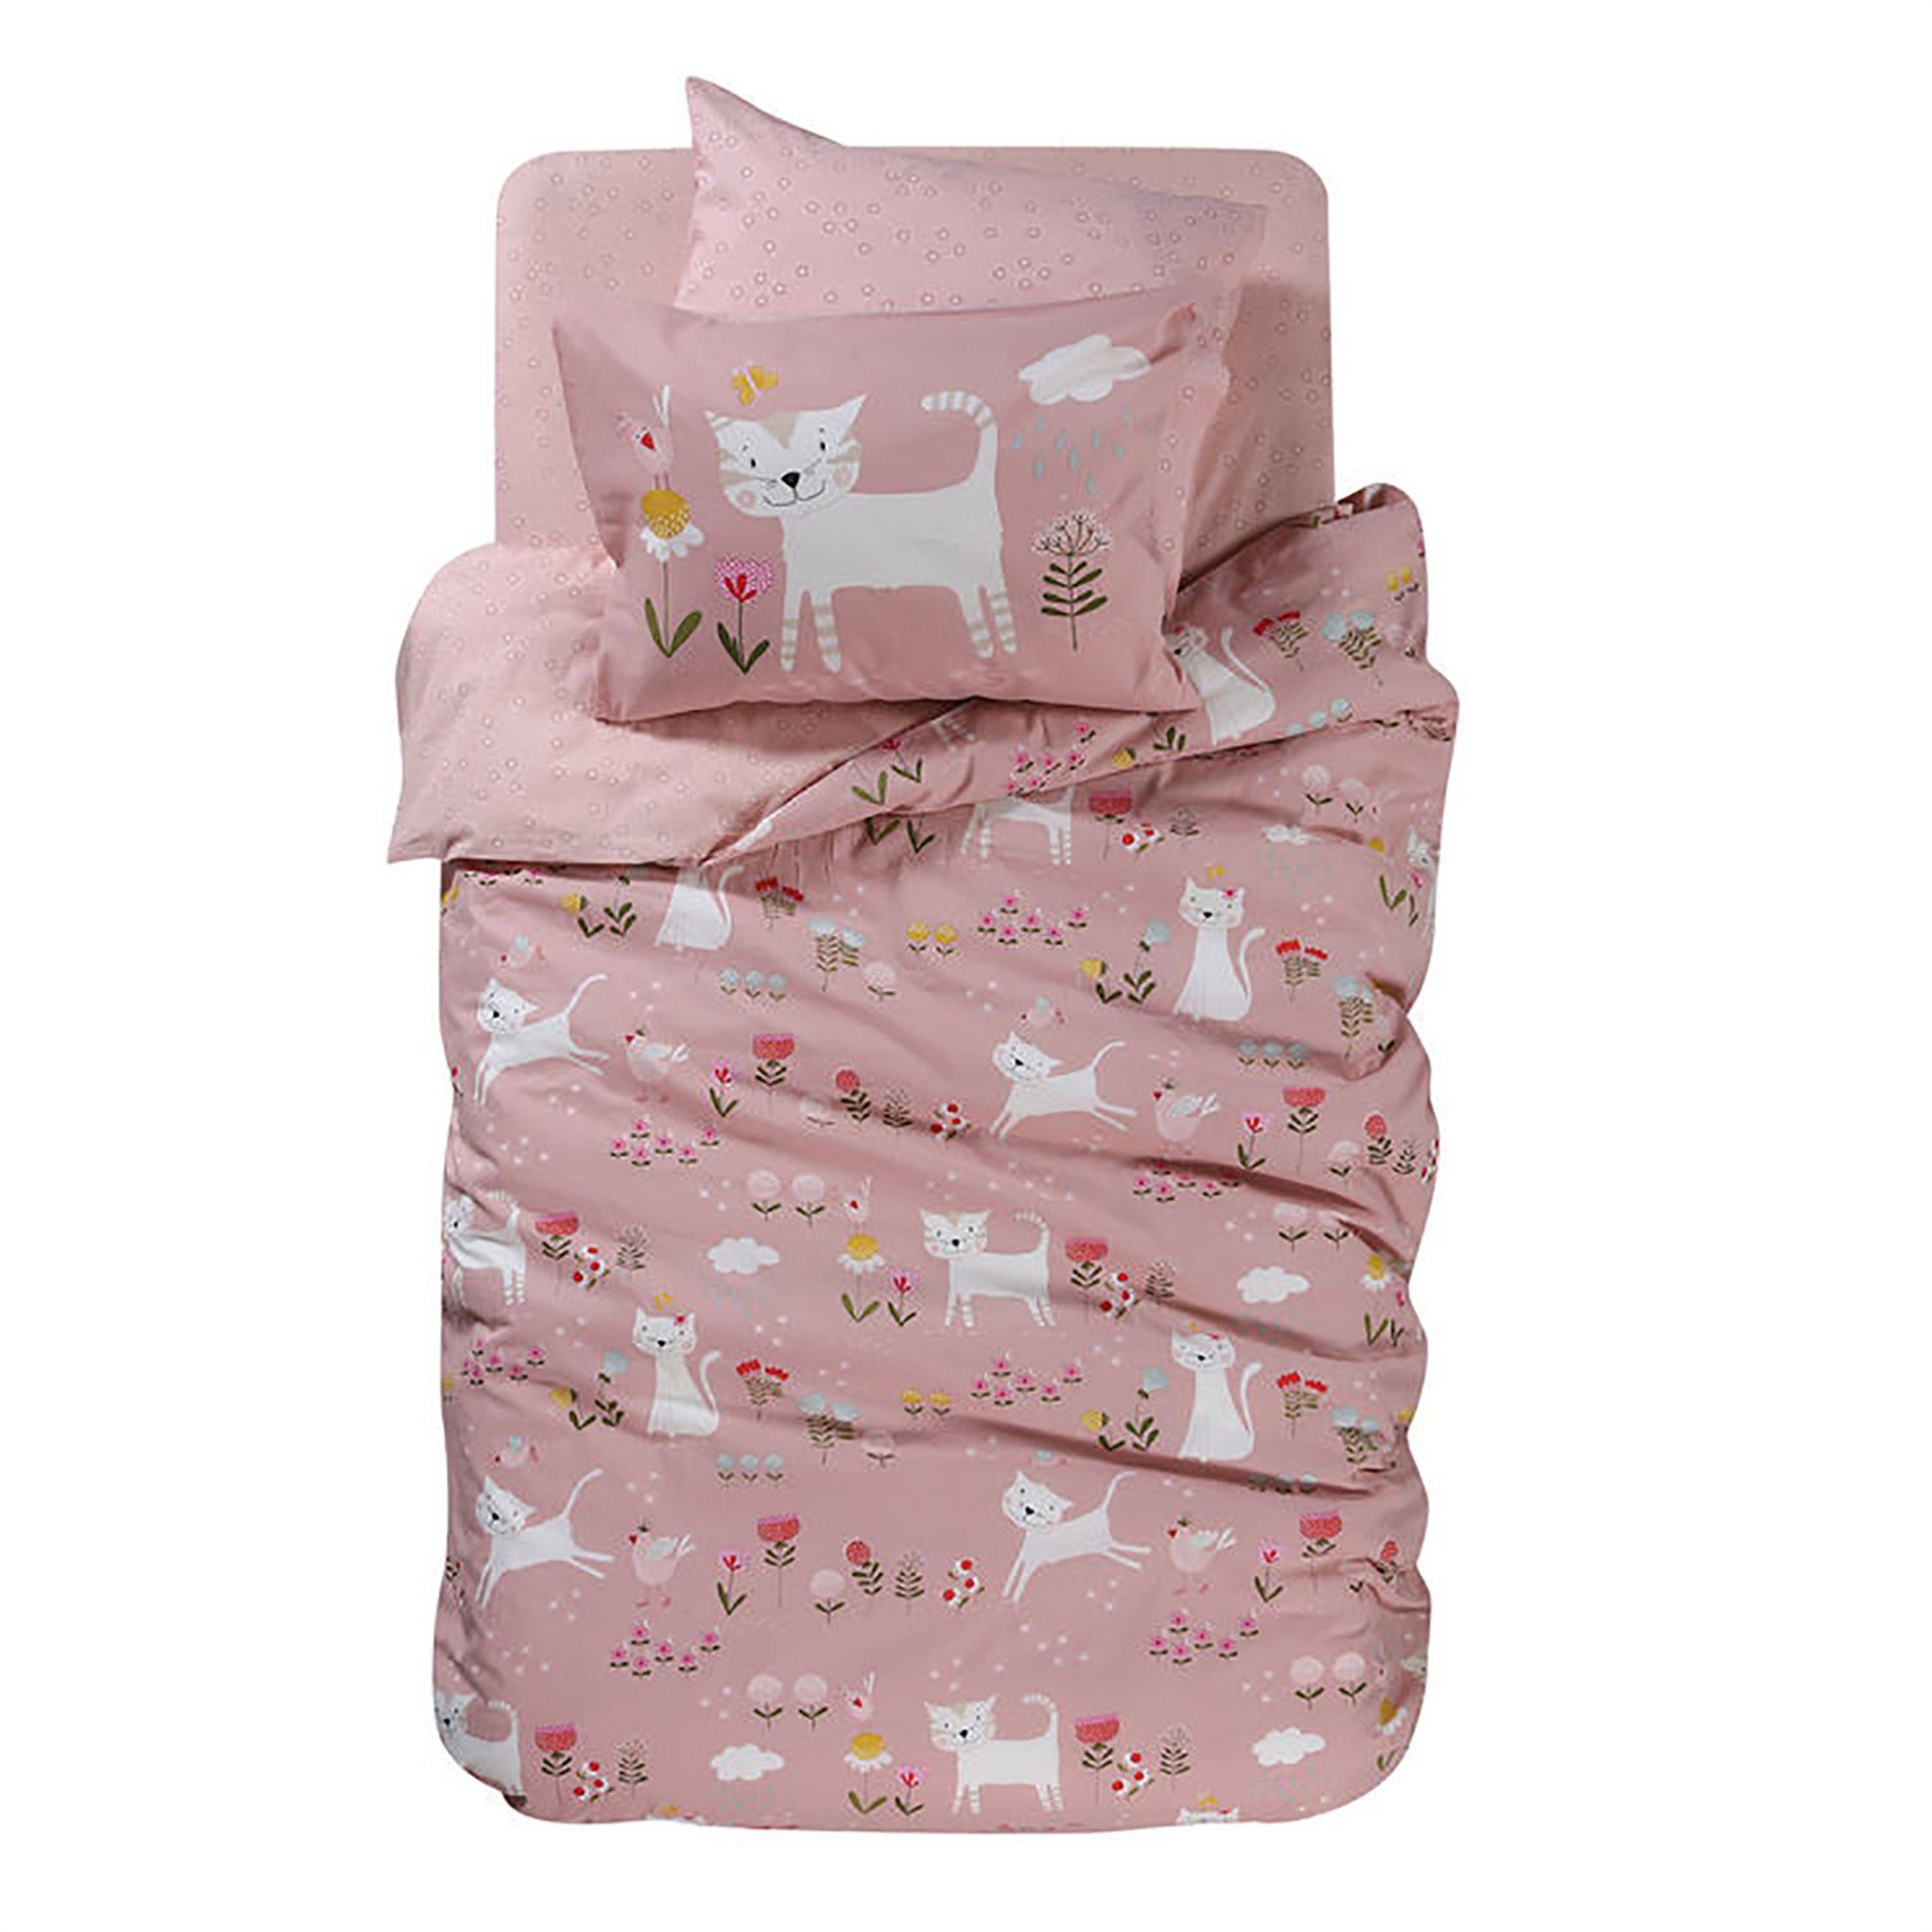 NEF-NEF Σετ παιδικά σεντόνια ροζ Smiling Kitty (3 τεμάχια) - 022271 - Ροζ home   παιδια   σεντόνια   σετ παιδικά σεντόνια